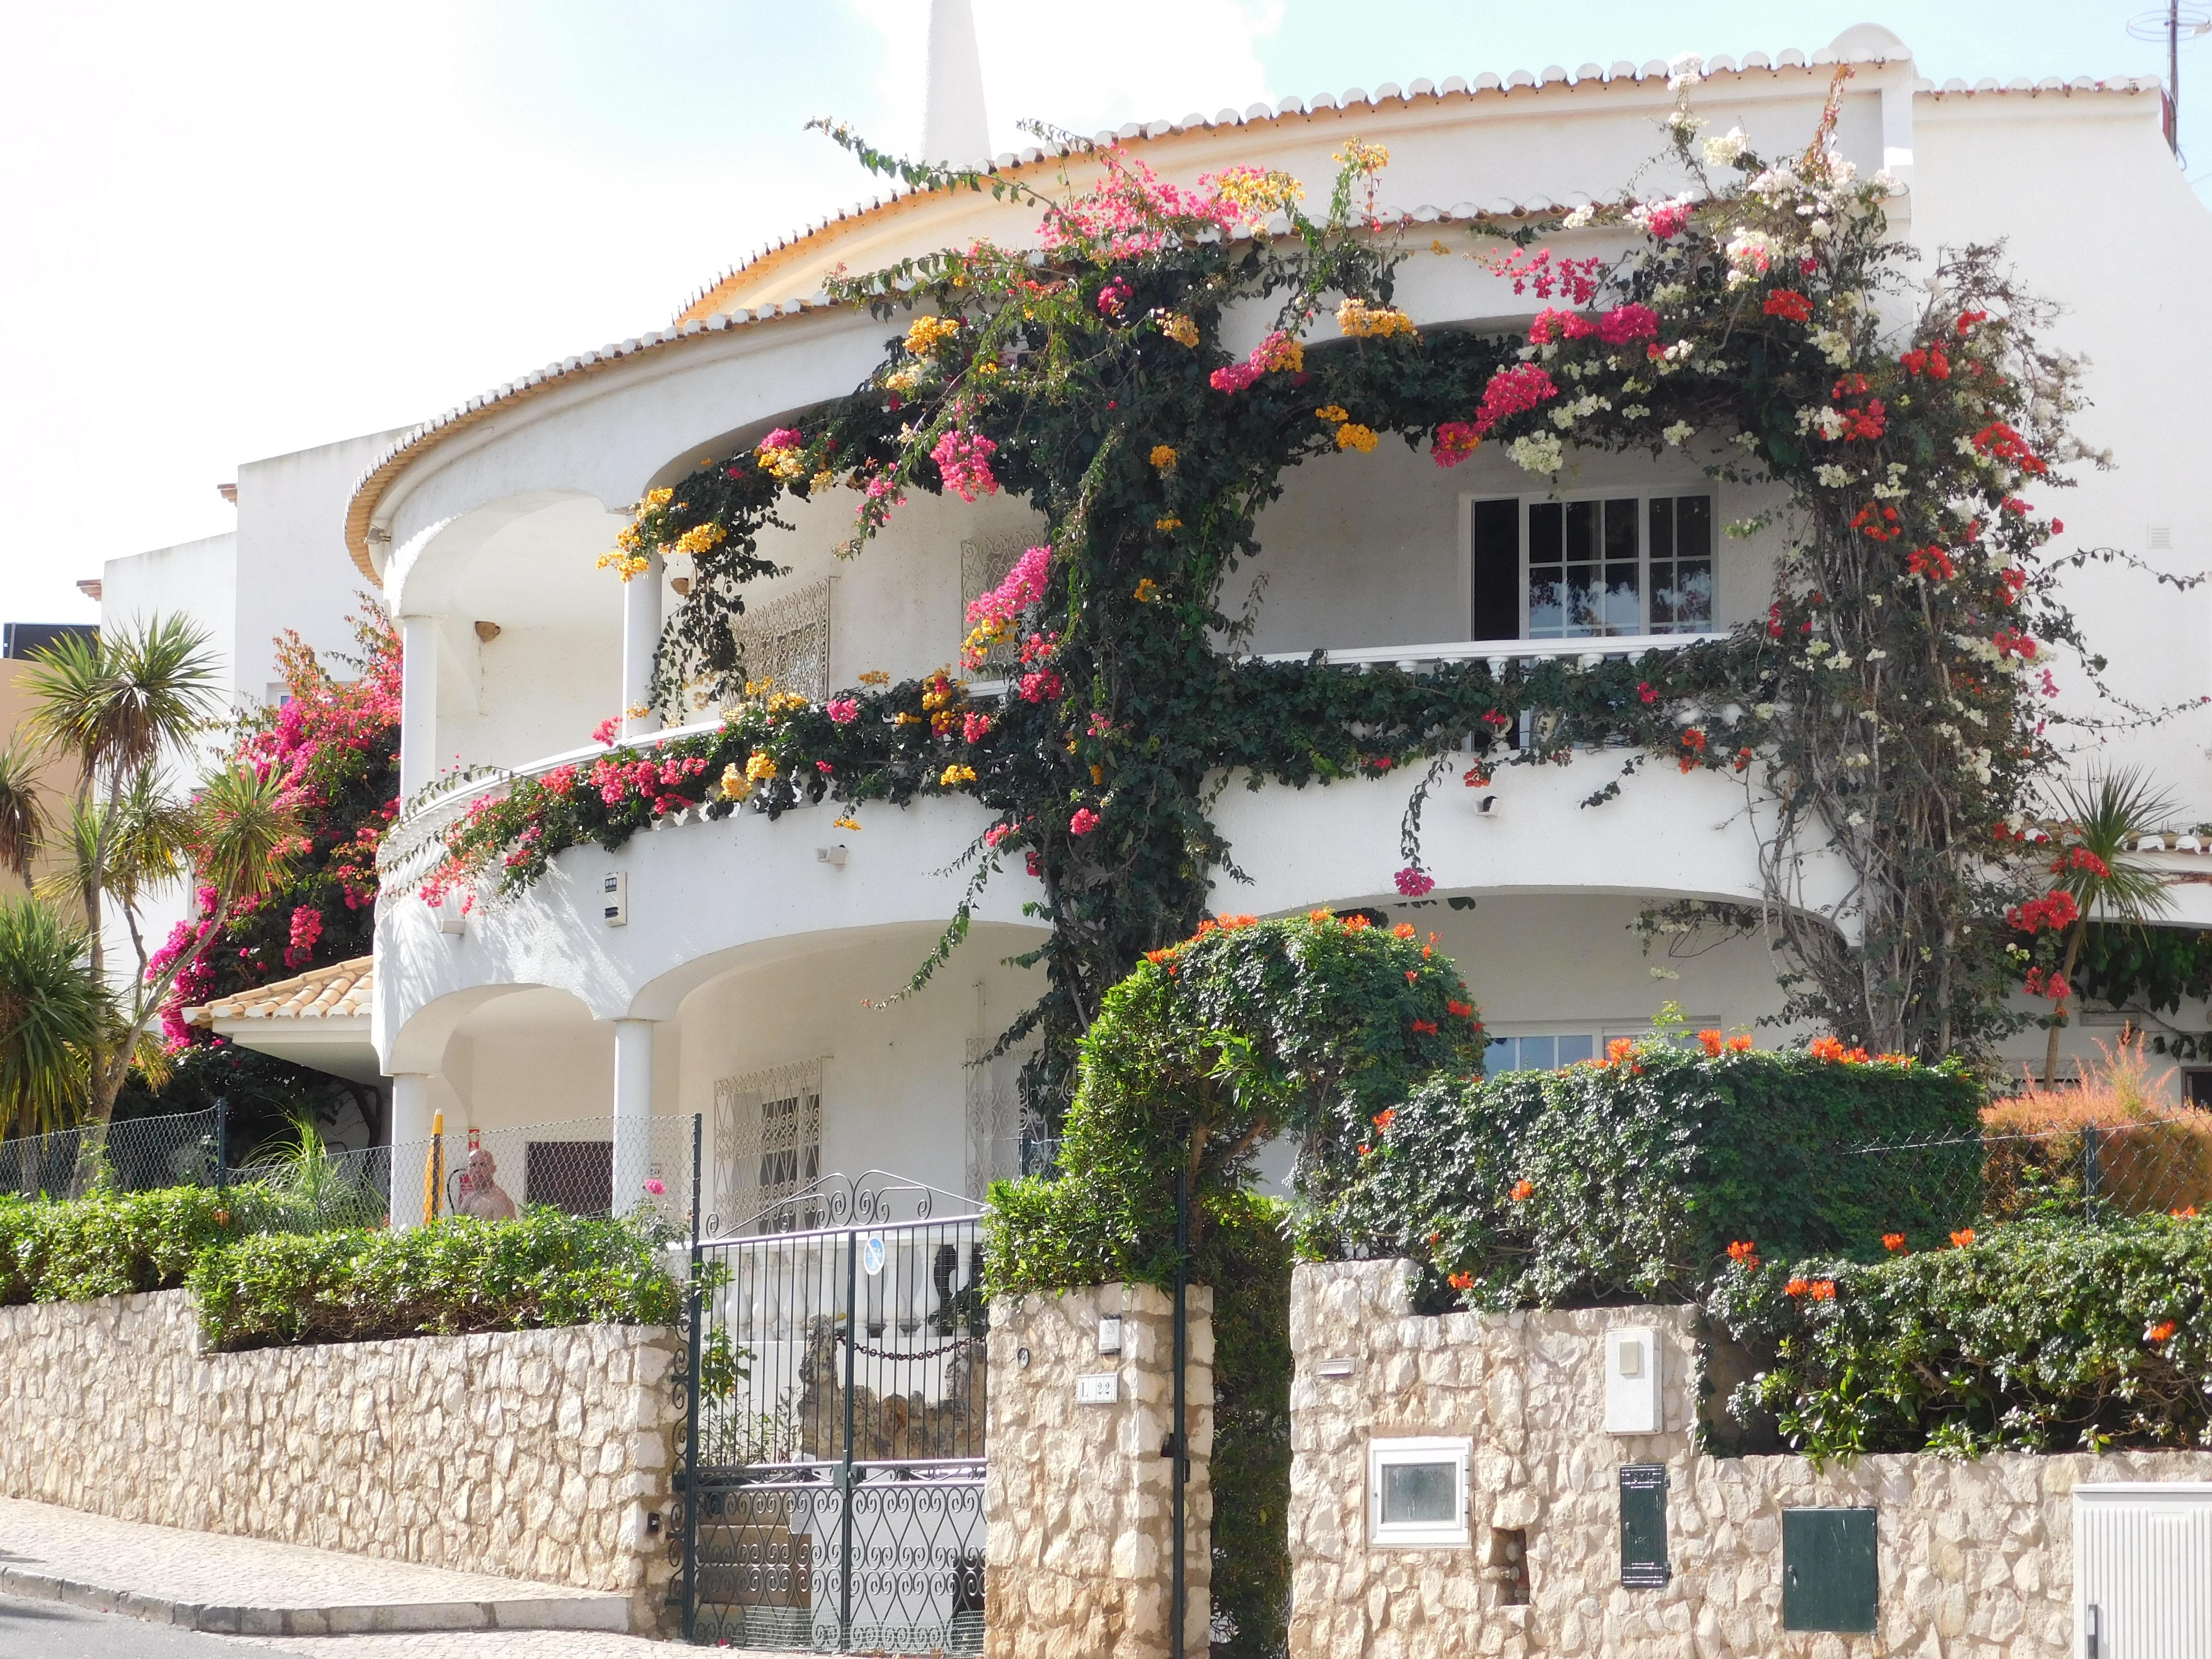 Free Images villa mansion village facade property flowers